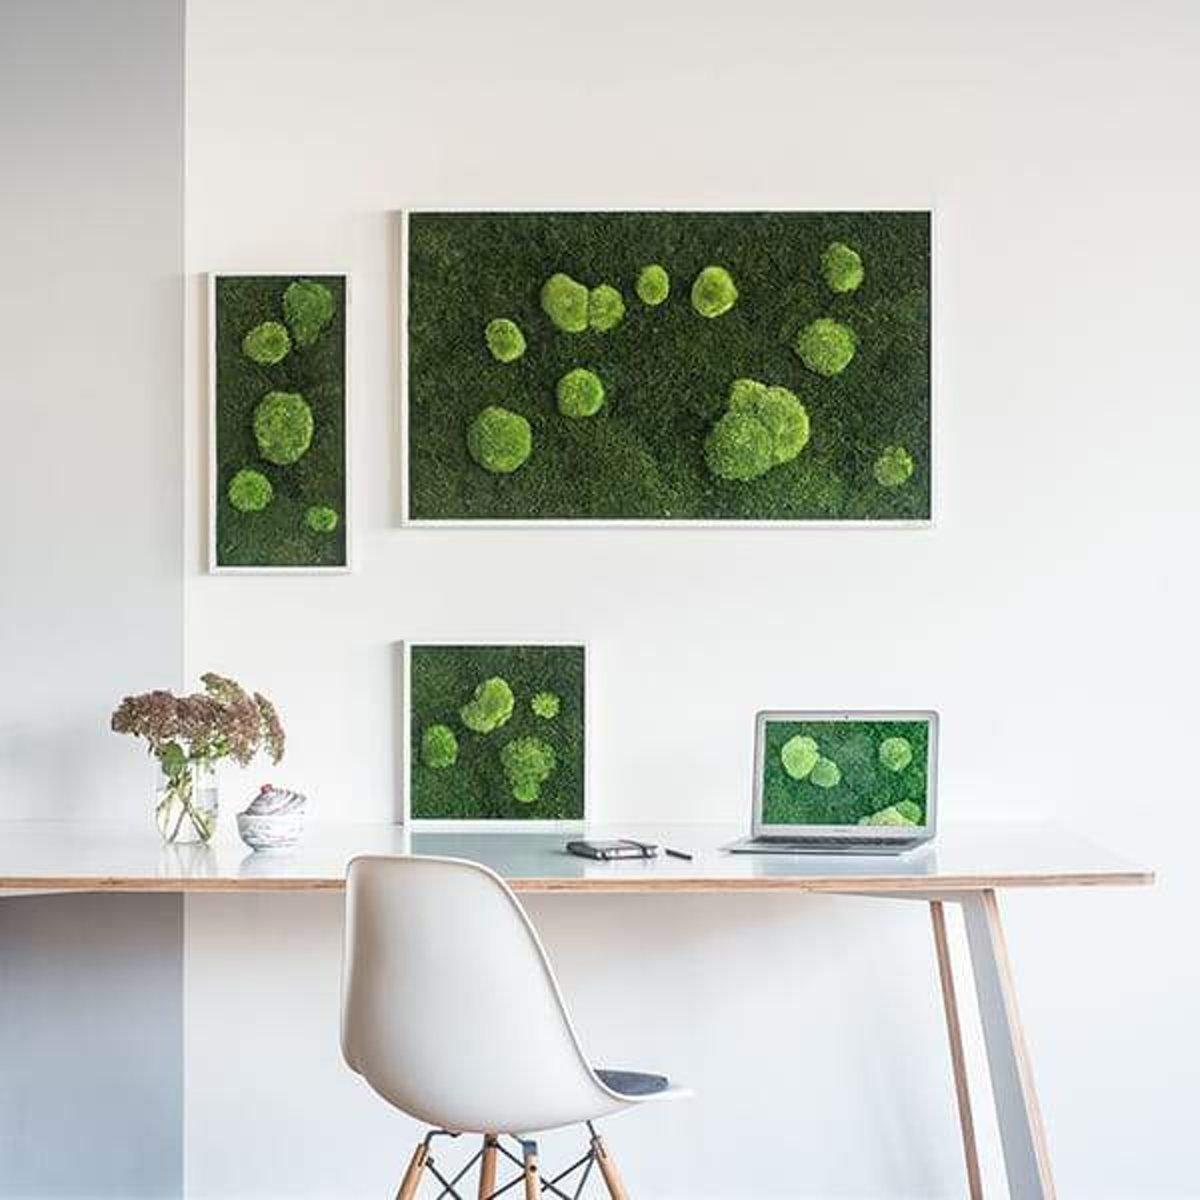 Verticale tuin - Flat & Pole moss - 35 x 35cm